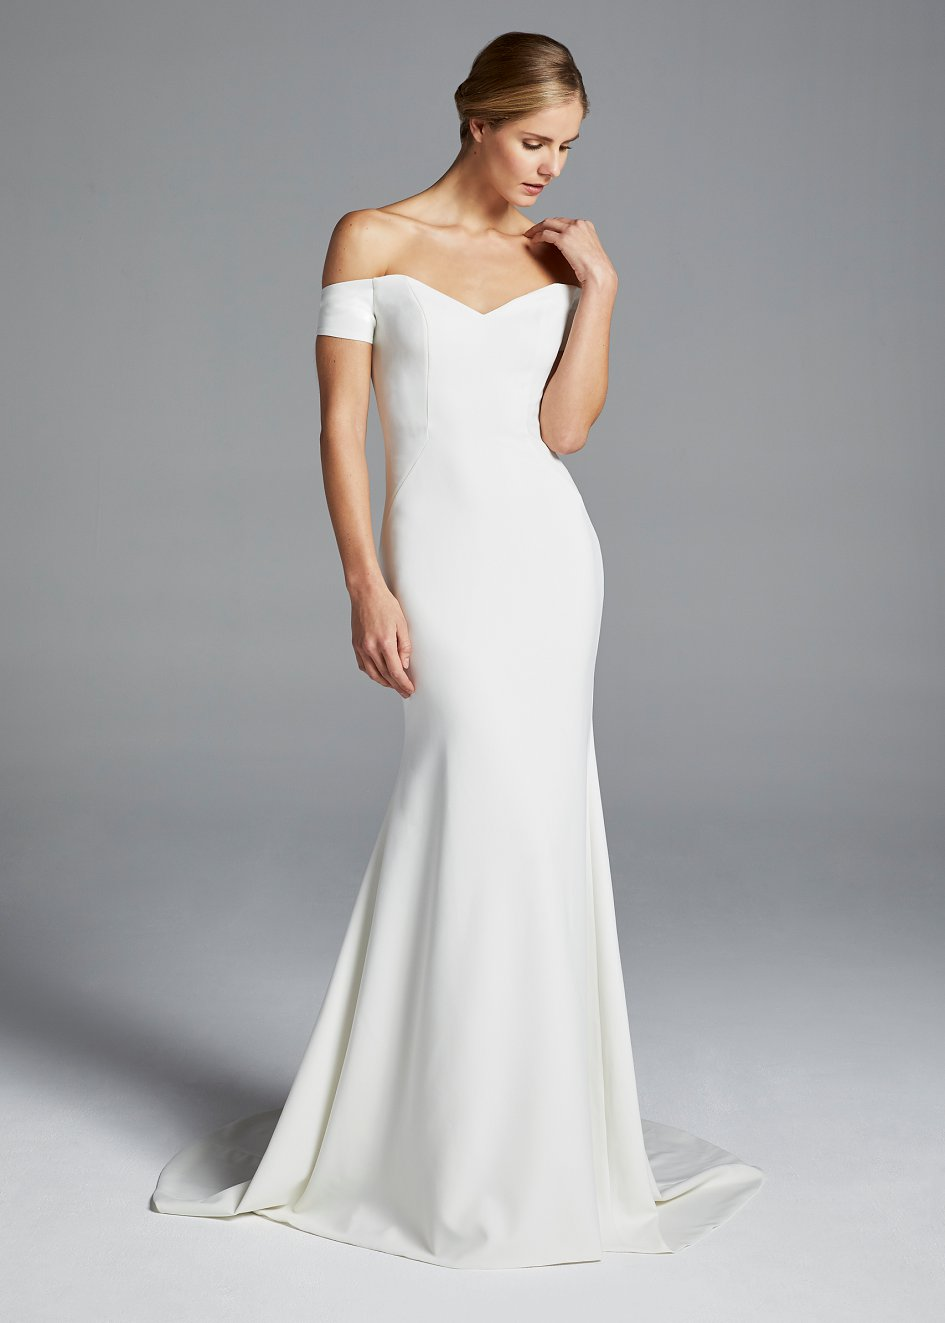 Sleek And Simple Minimal Wedding Dresses That Make A